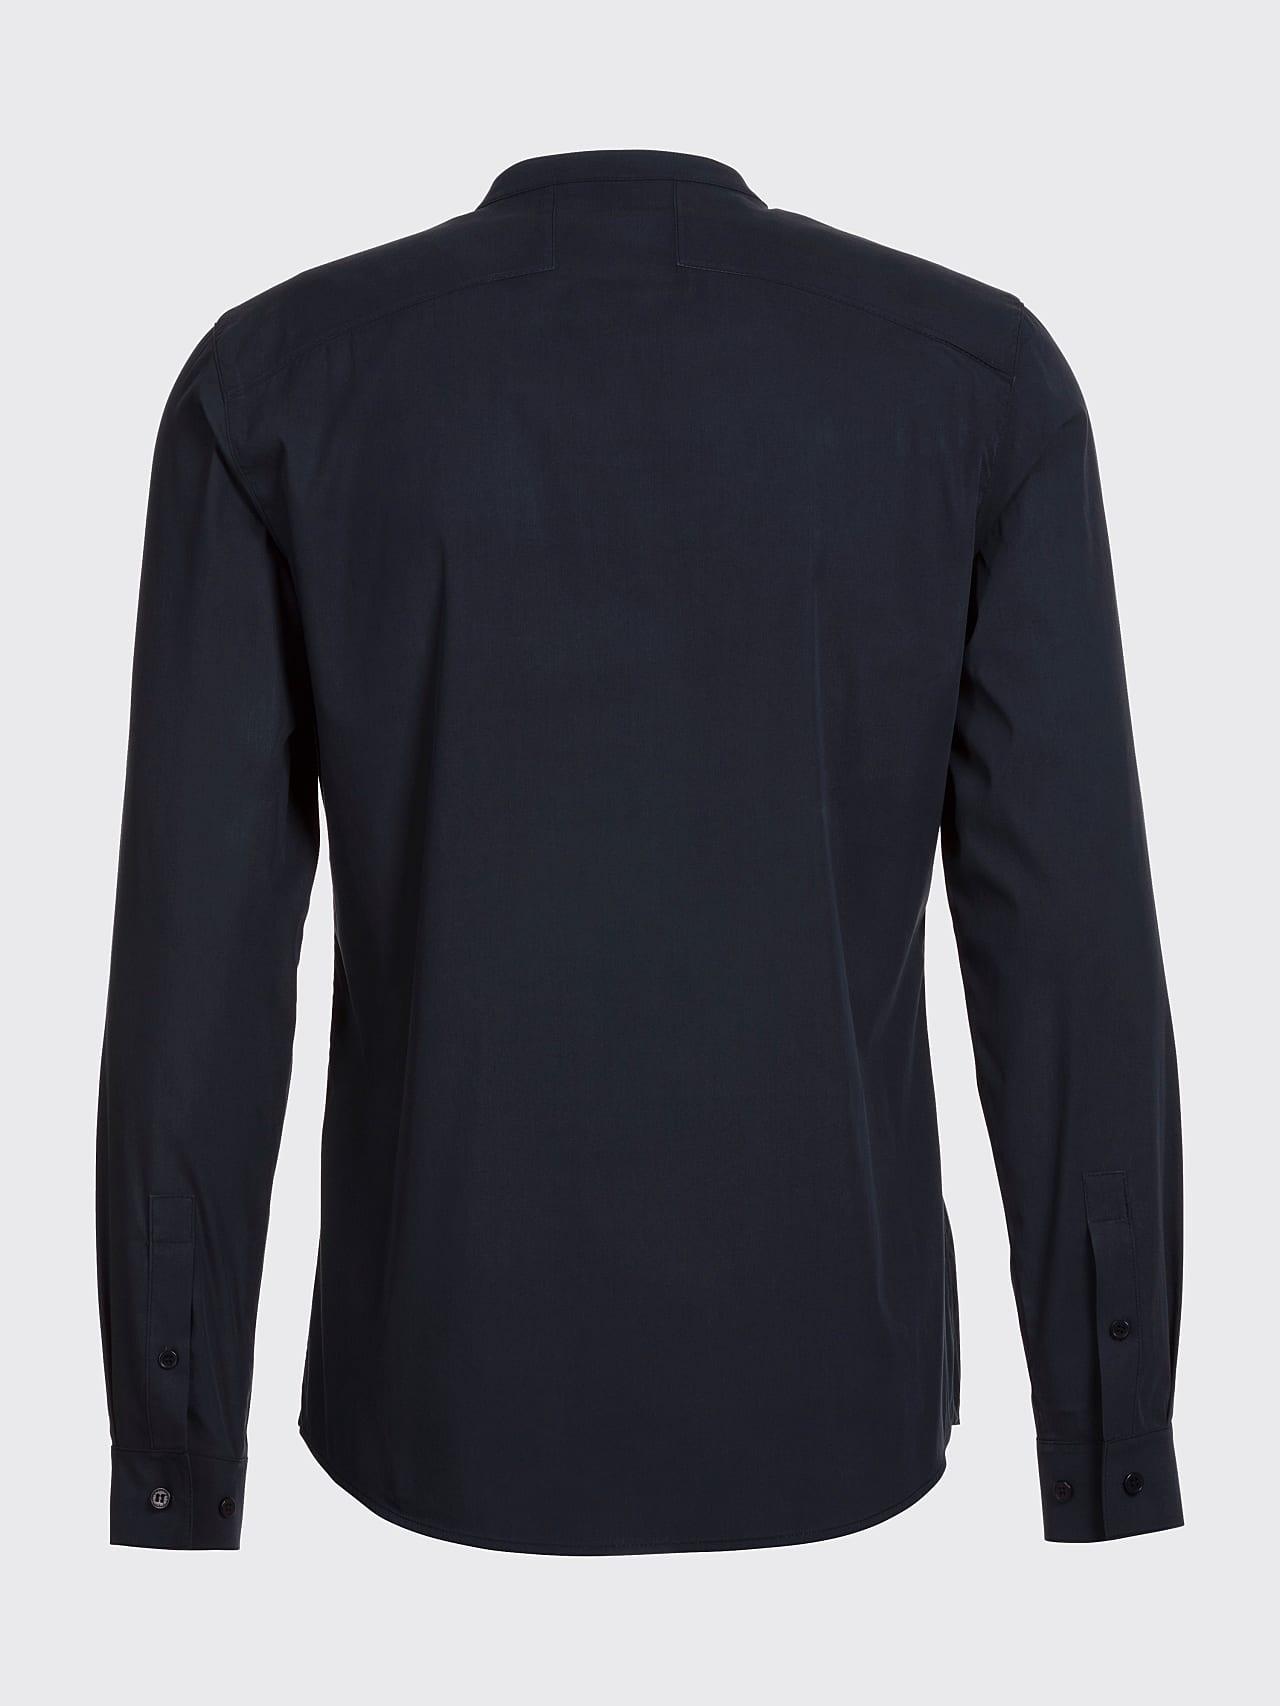 WIDT V9.Y5.01 Stand-Up Collar Cotton-Stretch Shirt navy Left Alpha Tauri